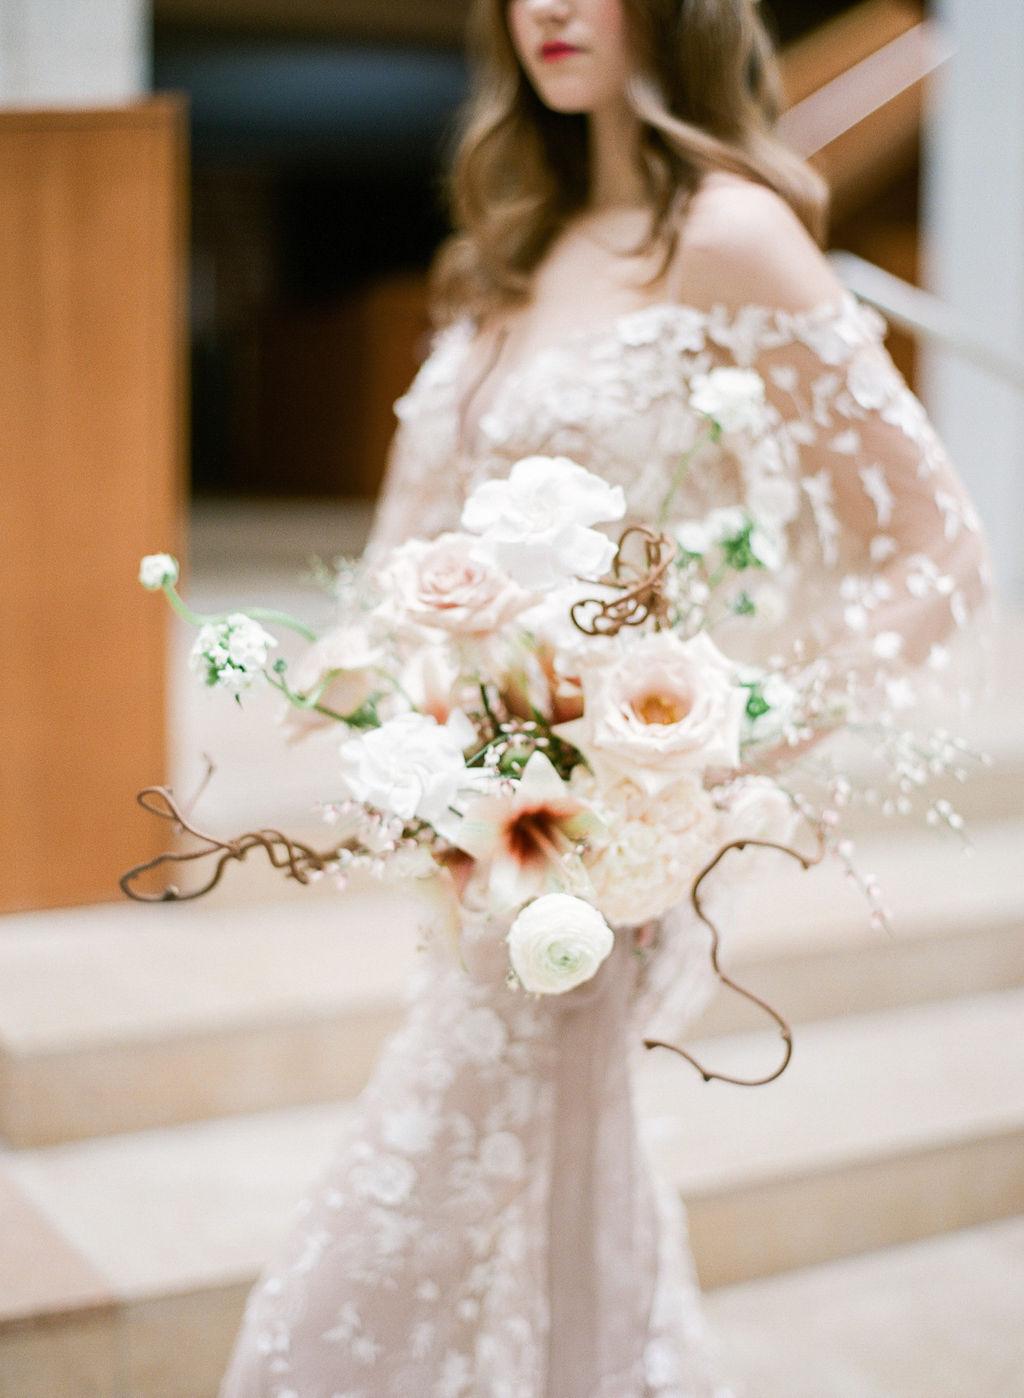 artiese-ago-wedding-editorial-000423650005.jpg